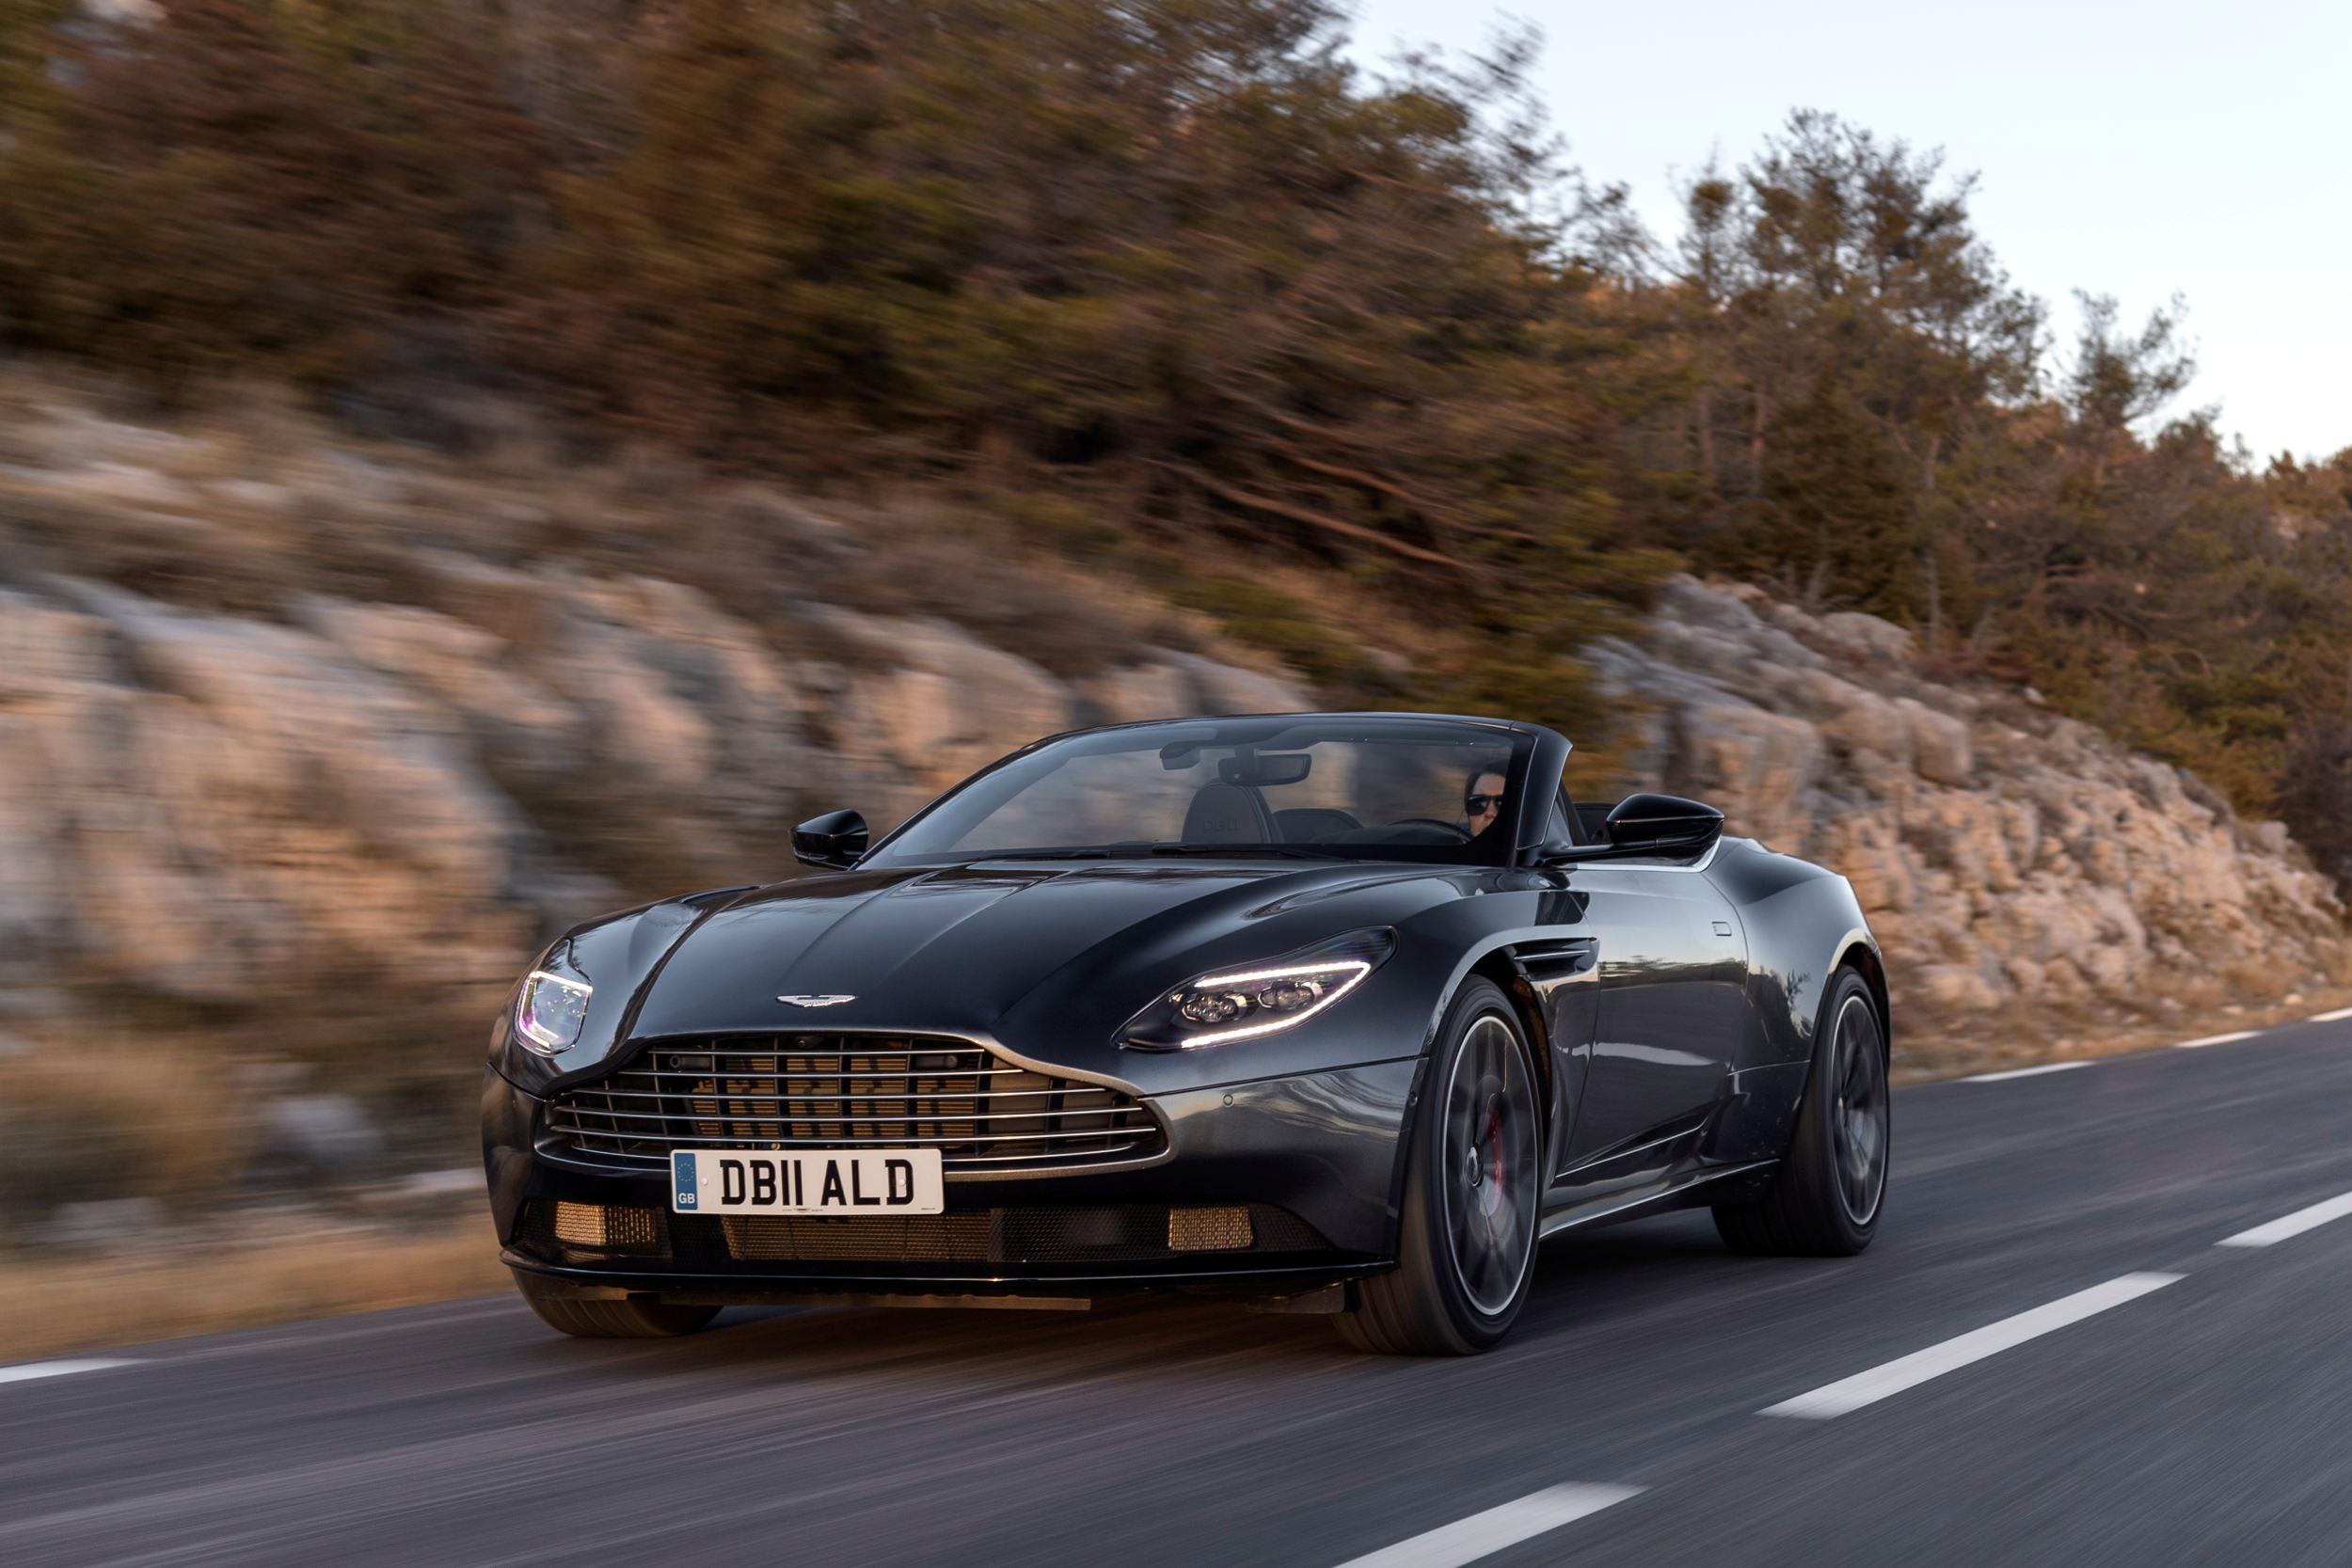 Aston Martin Db11 Volante V8 Specs Performance Data Fastestlaps Com